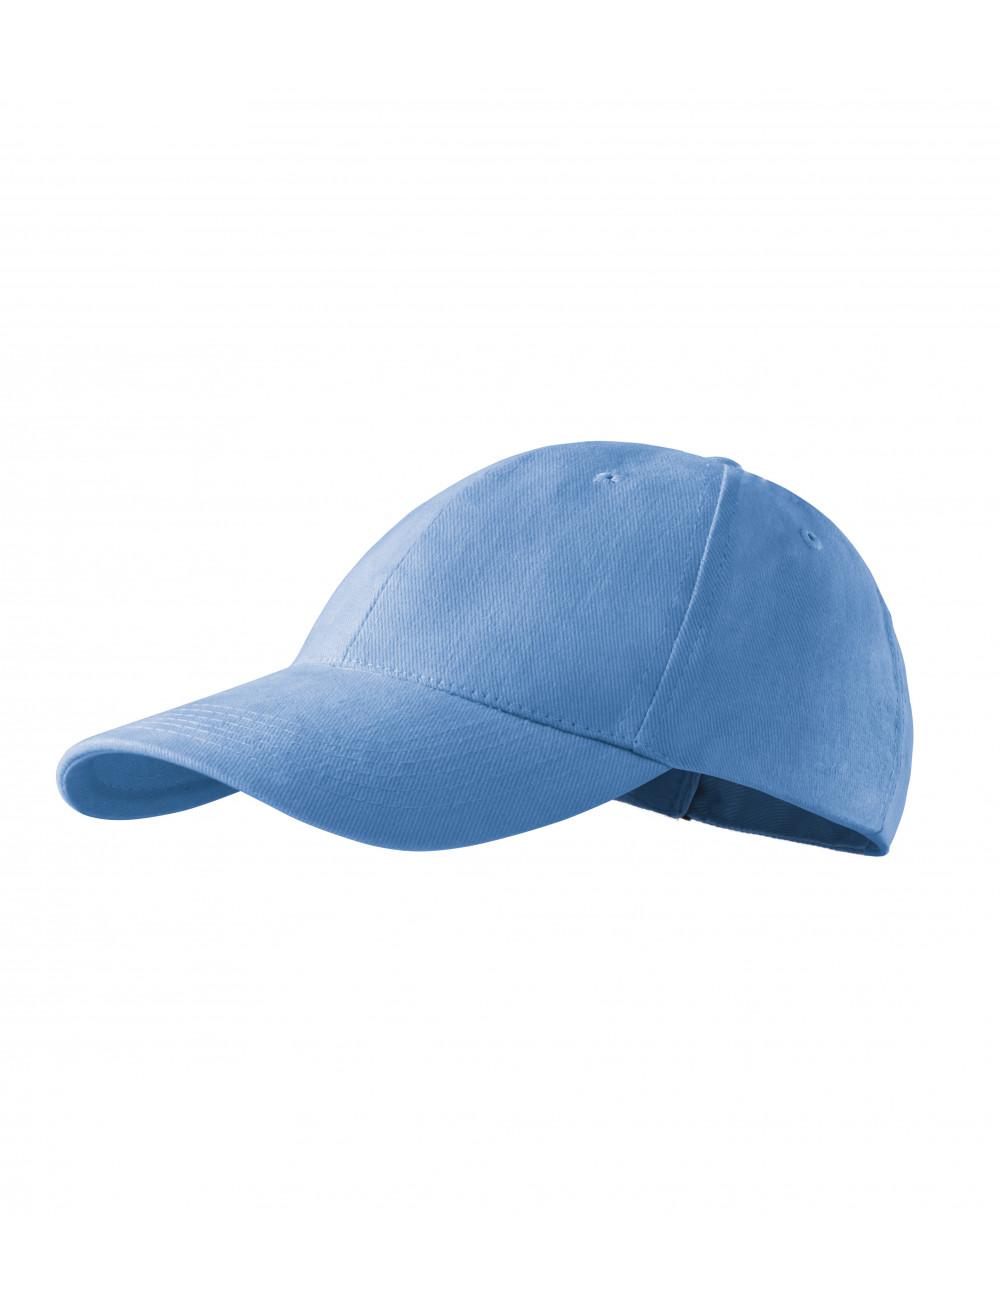 Adler MALFINI Czapka unisex 6P 305 błękitny